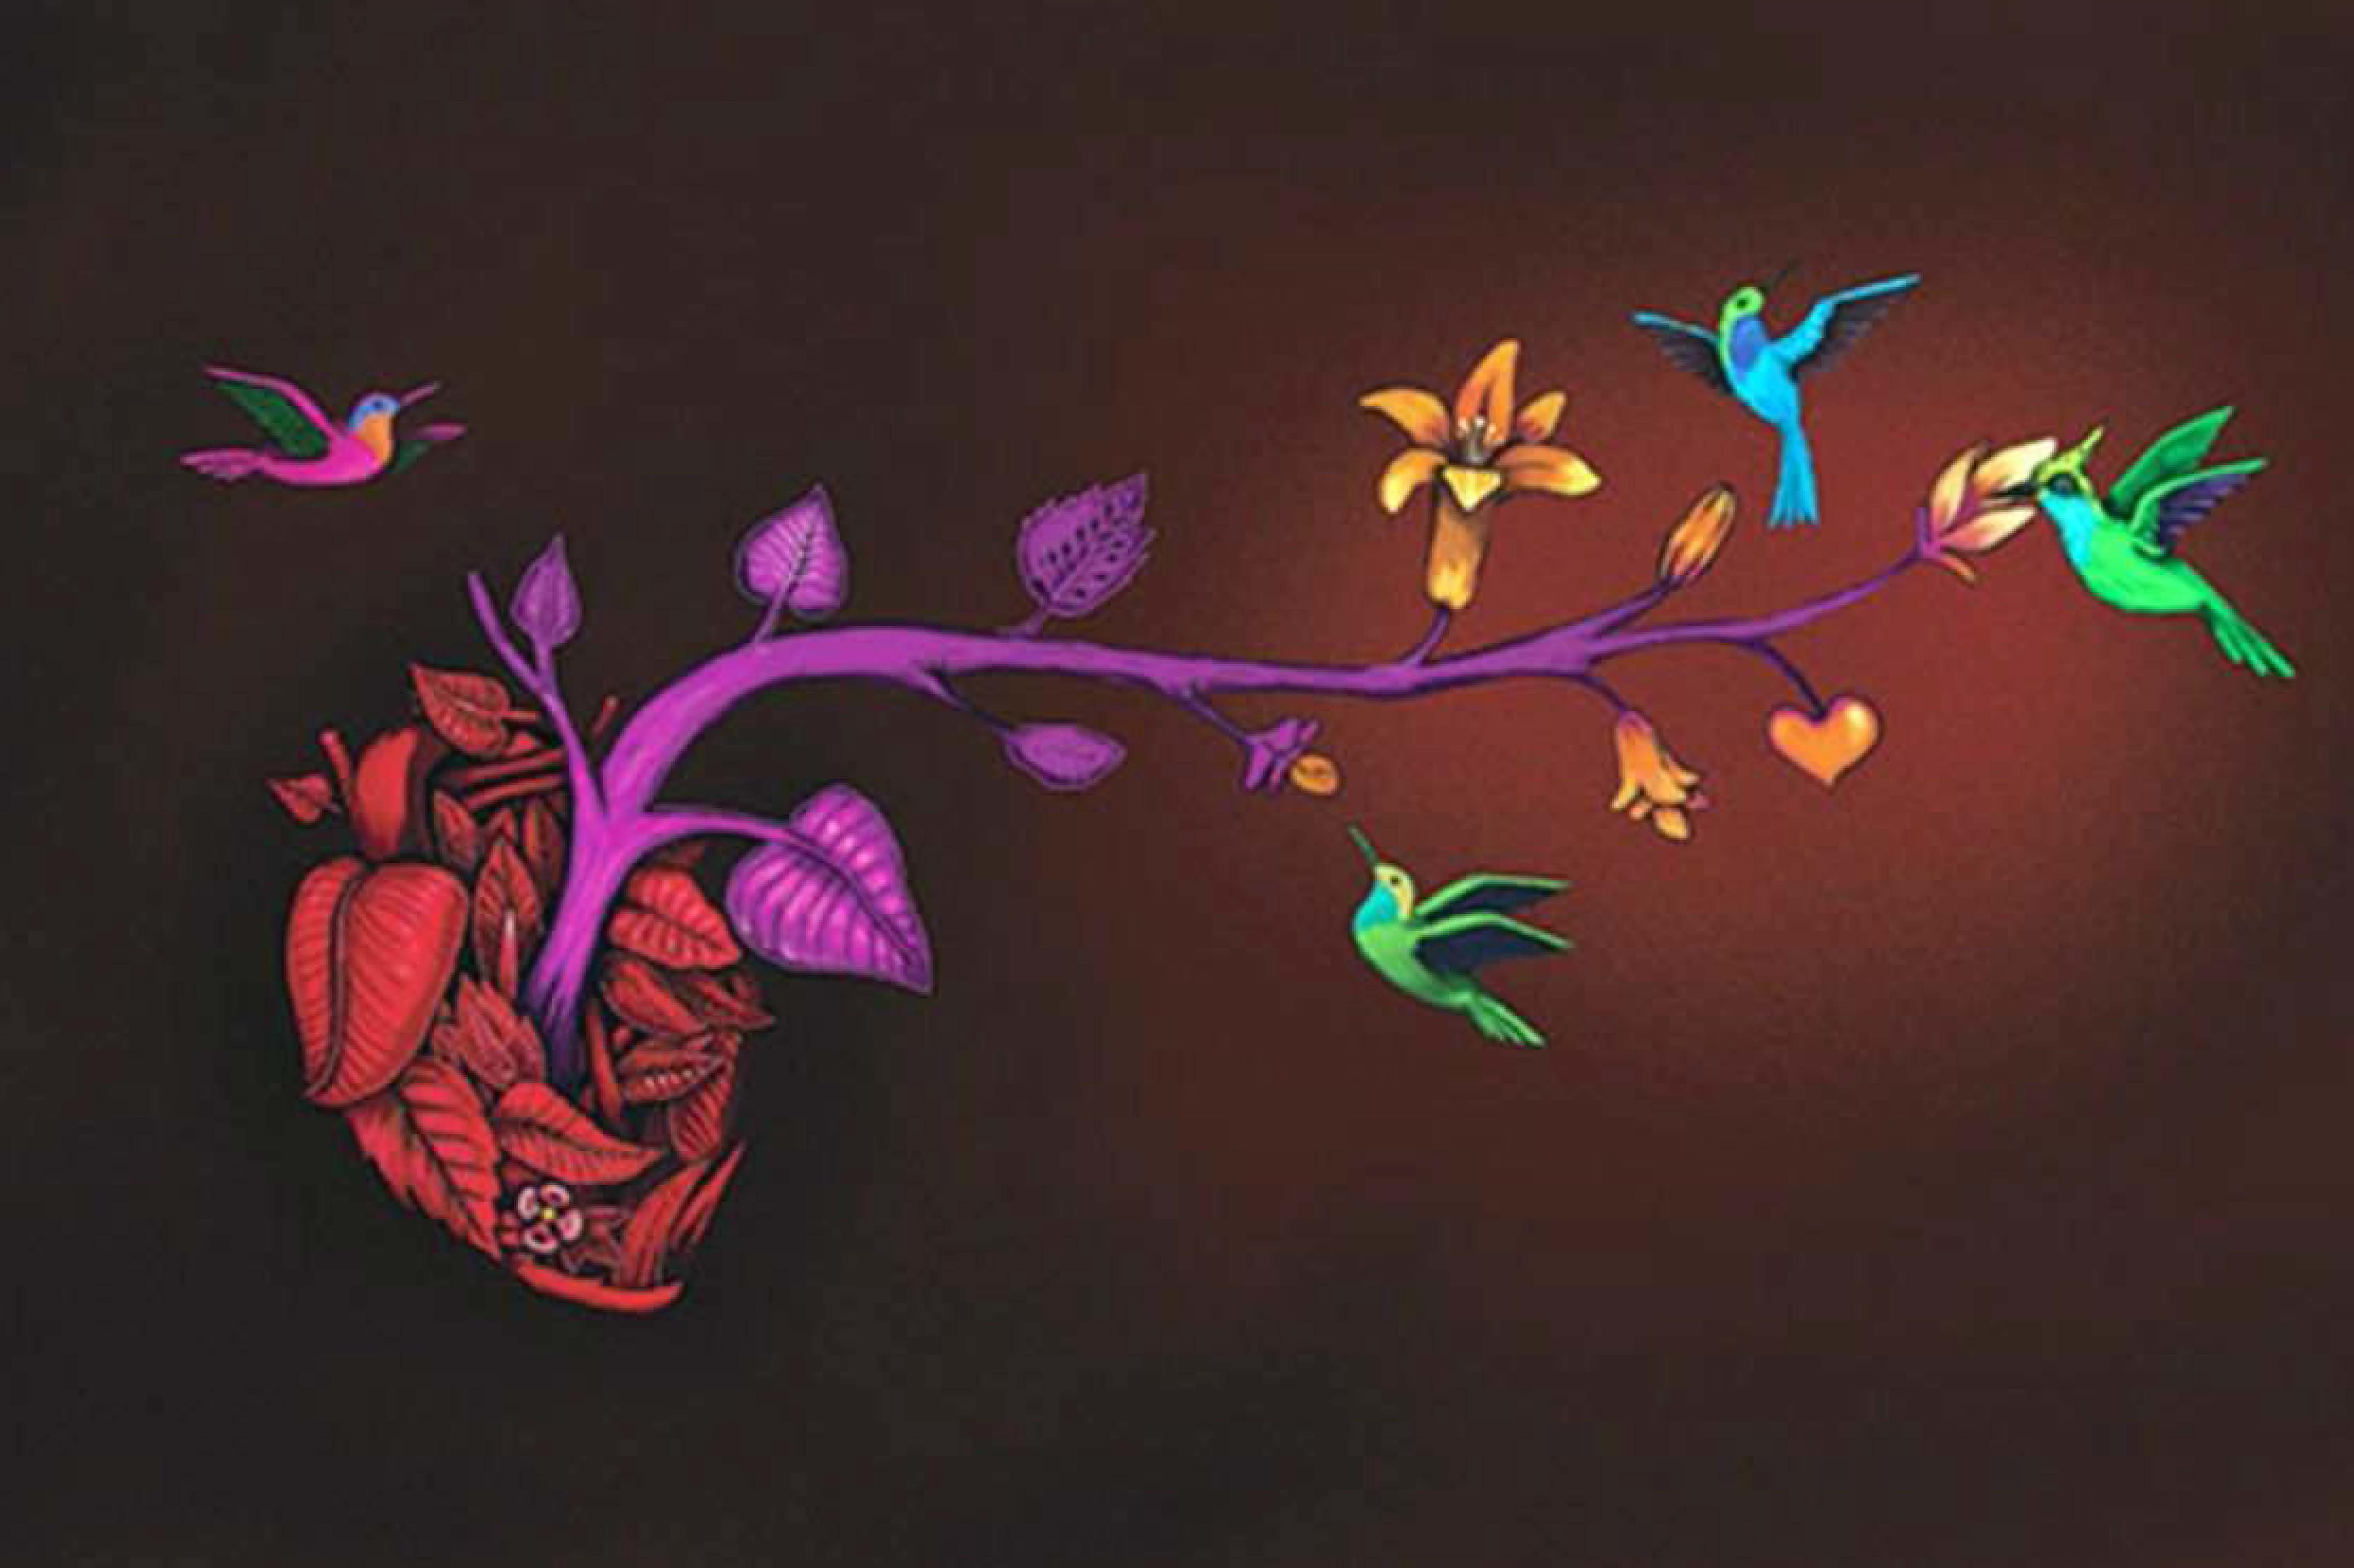 imagen de un corazón del que salen ramas floridas